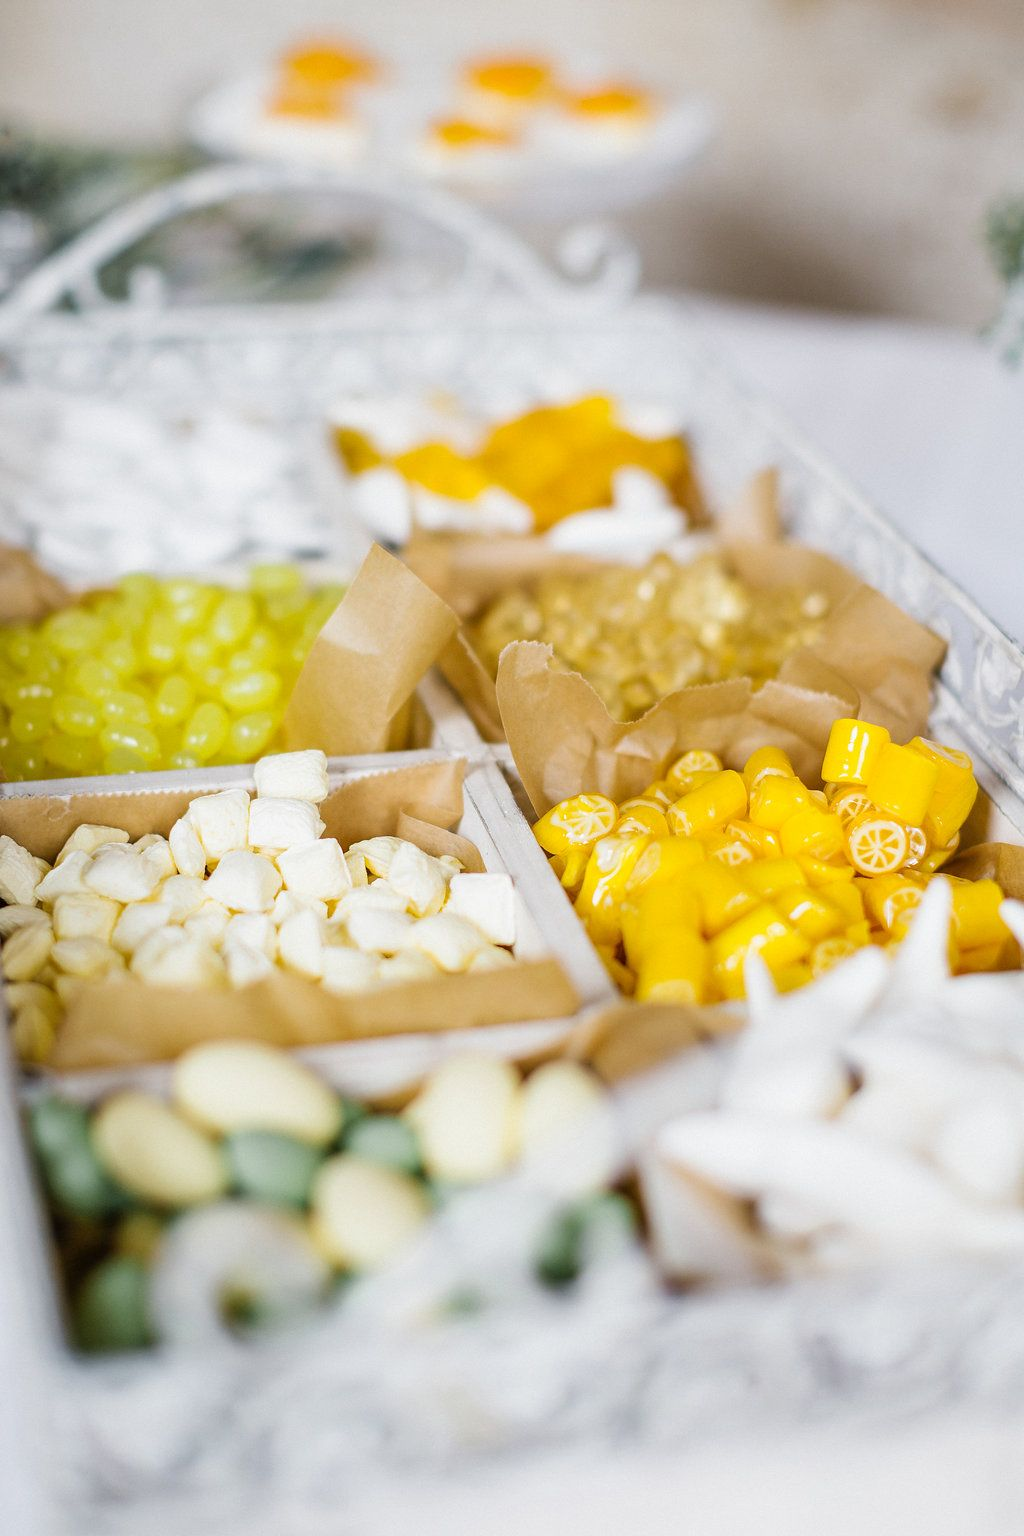 bonbons gelb auswahl candybar